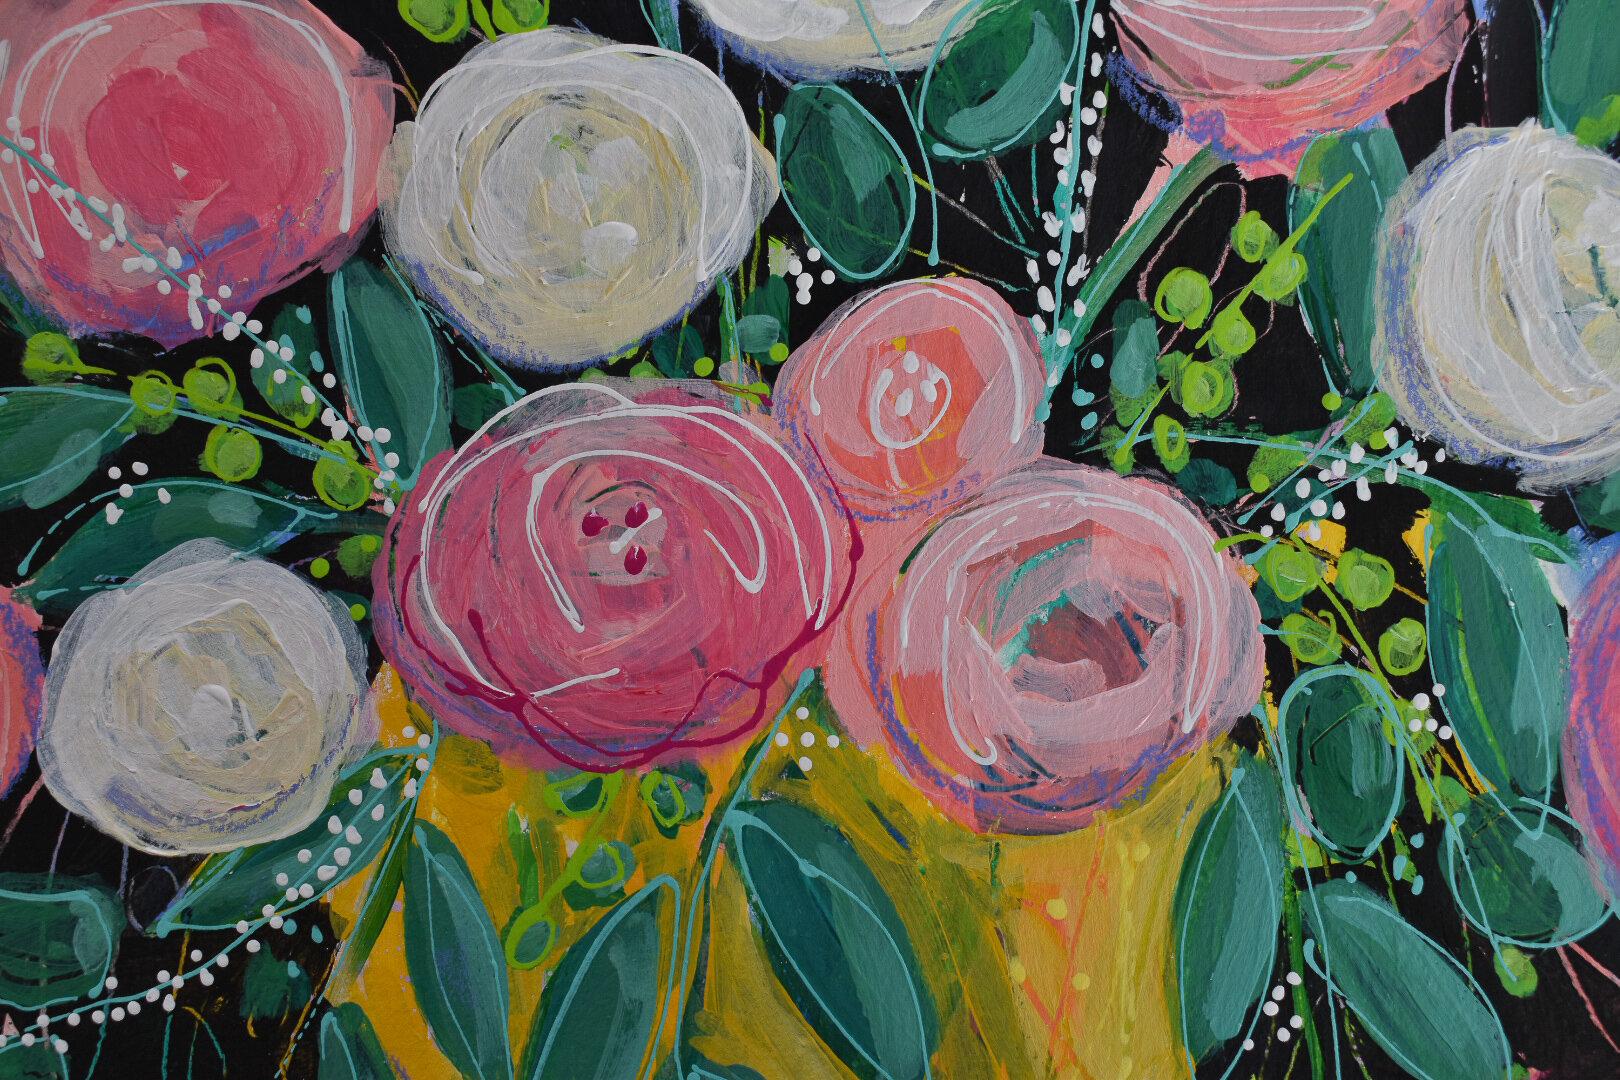 boho_eclectic_painting_art_stripes_daisyfaithart_pink_6.jpg